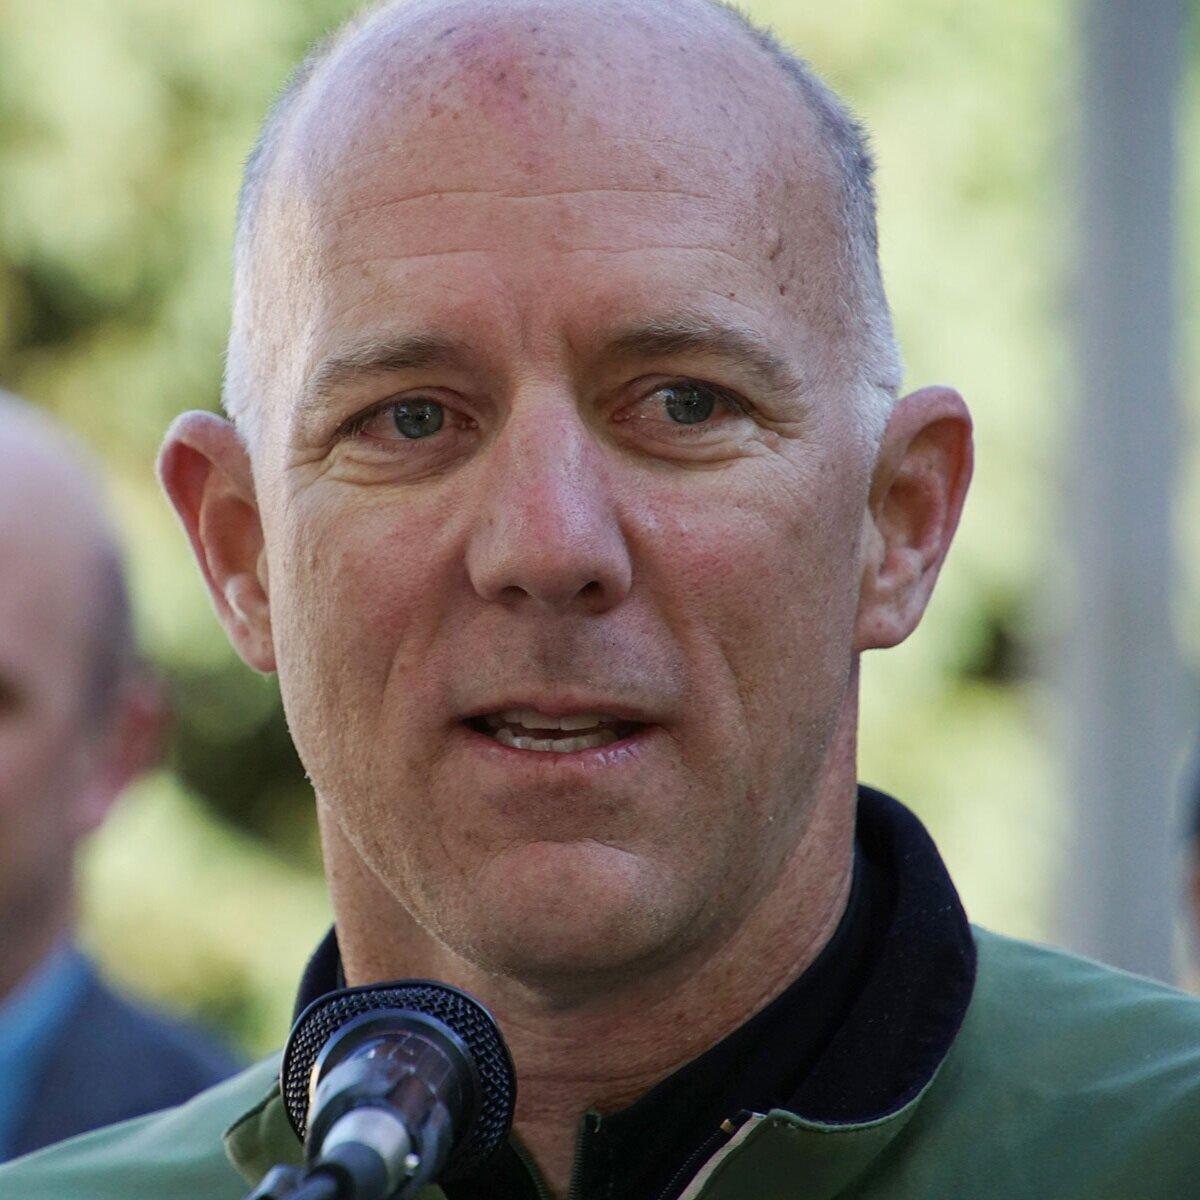 Jeff Polenske